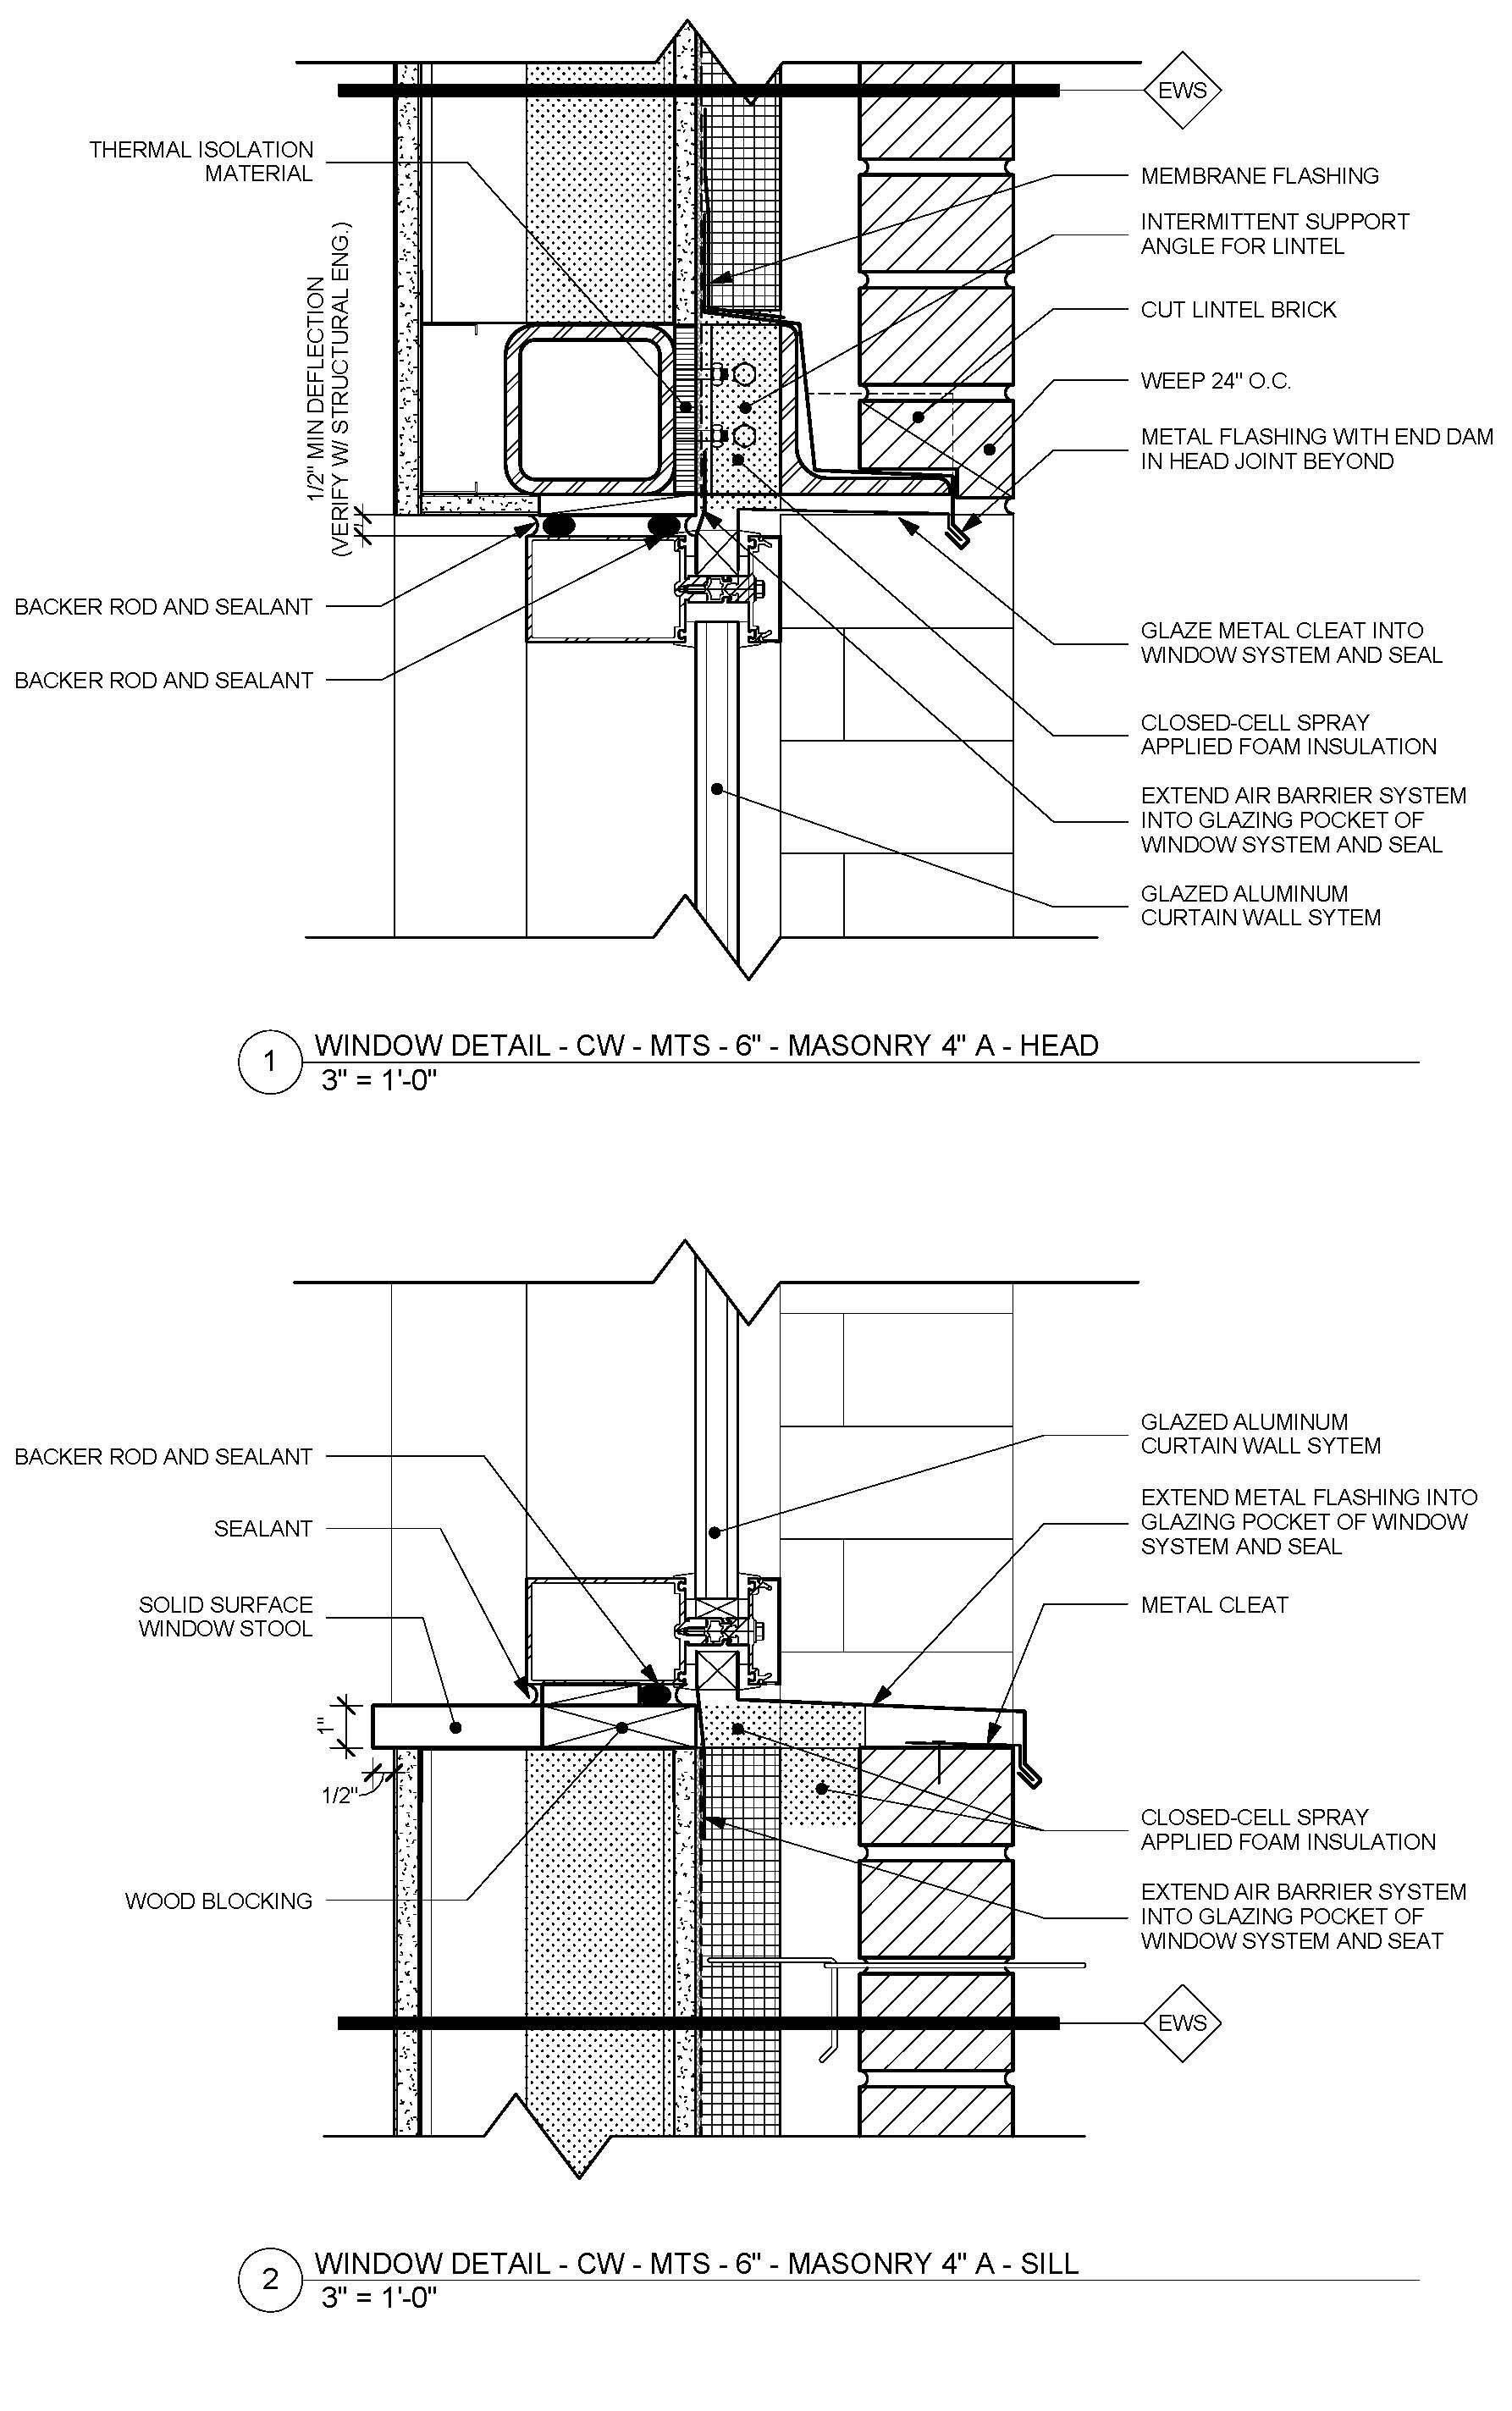 Pin By Joojoo On Details Drawings Cladding Design Masonry Window Architecture